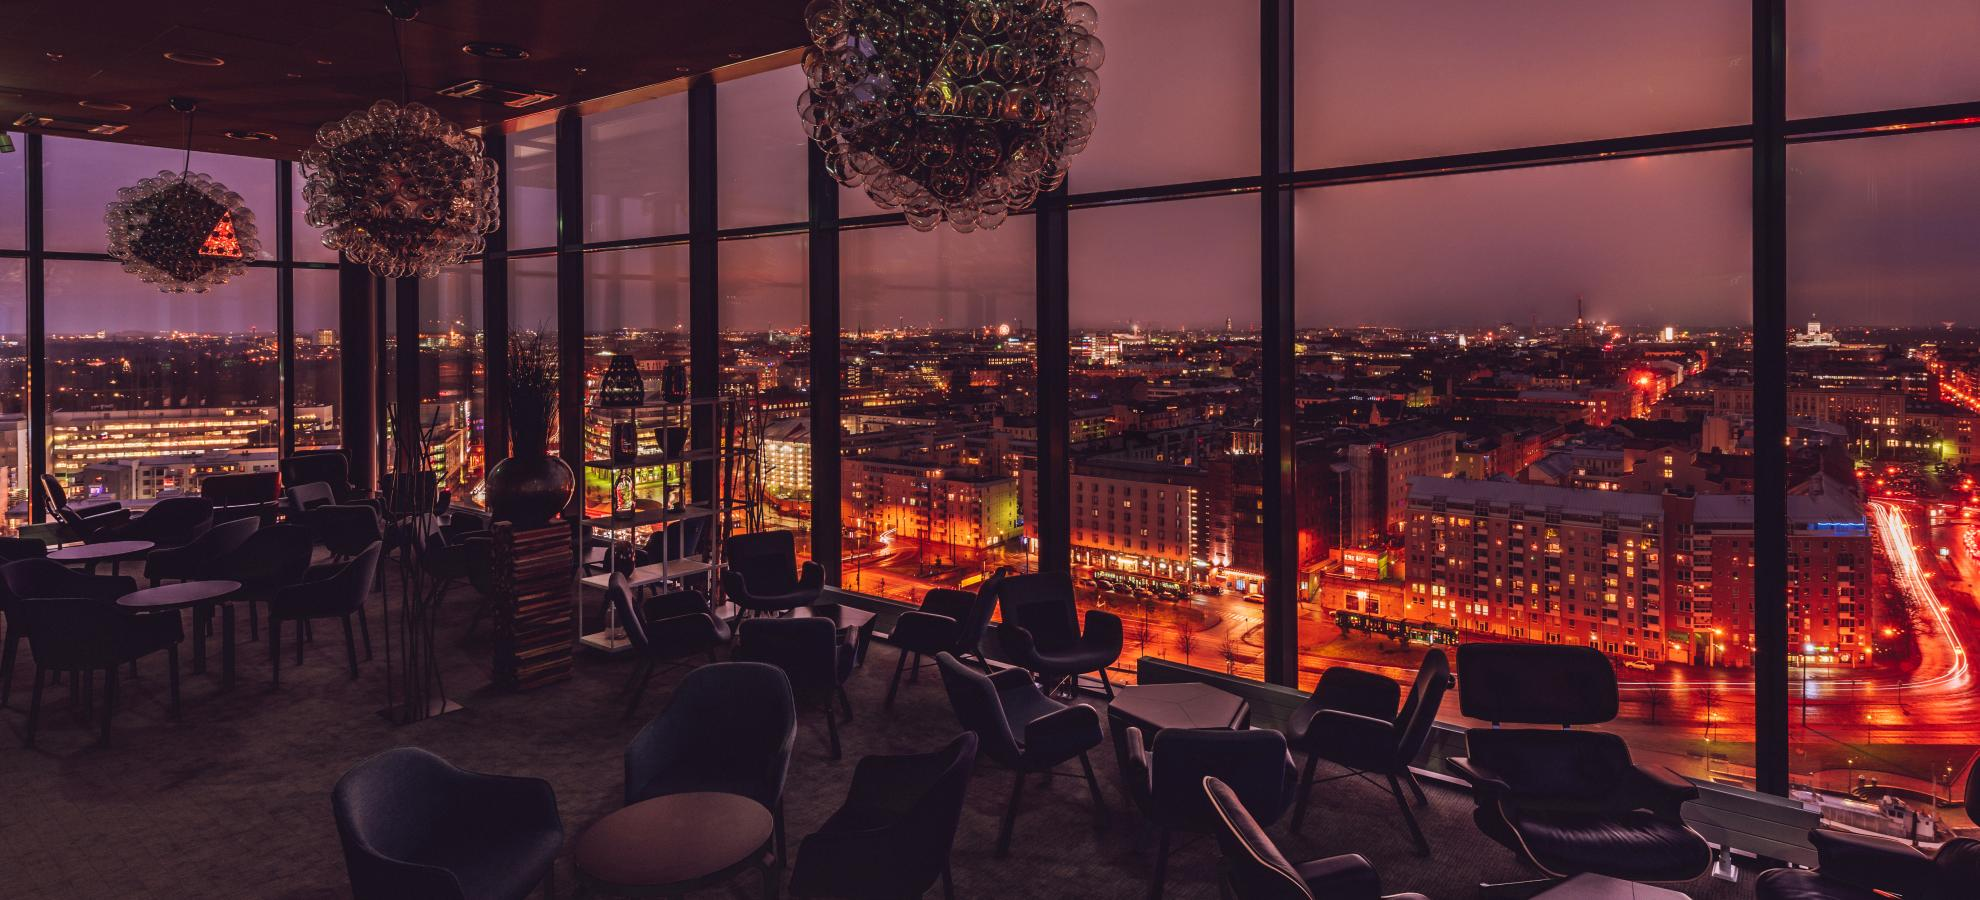 001-Clarion-Helsinki-Hotel-Helsinki-Skyroom-12-2016-HIGH-RES-2